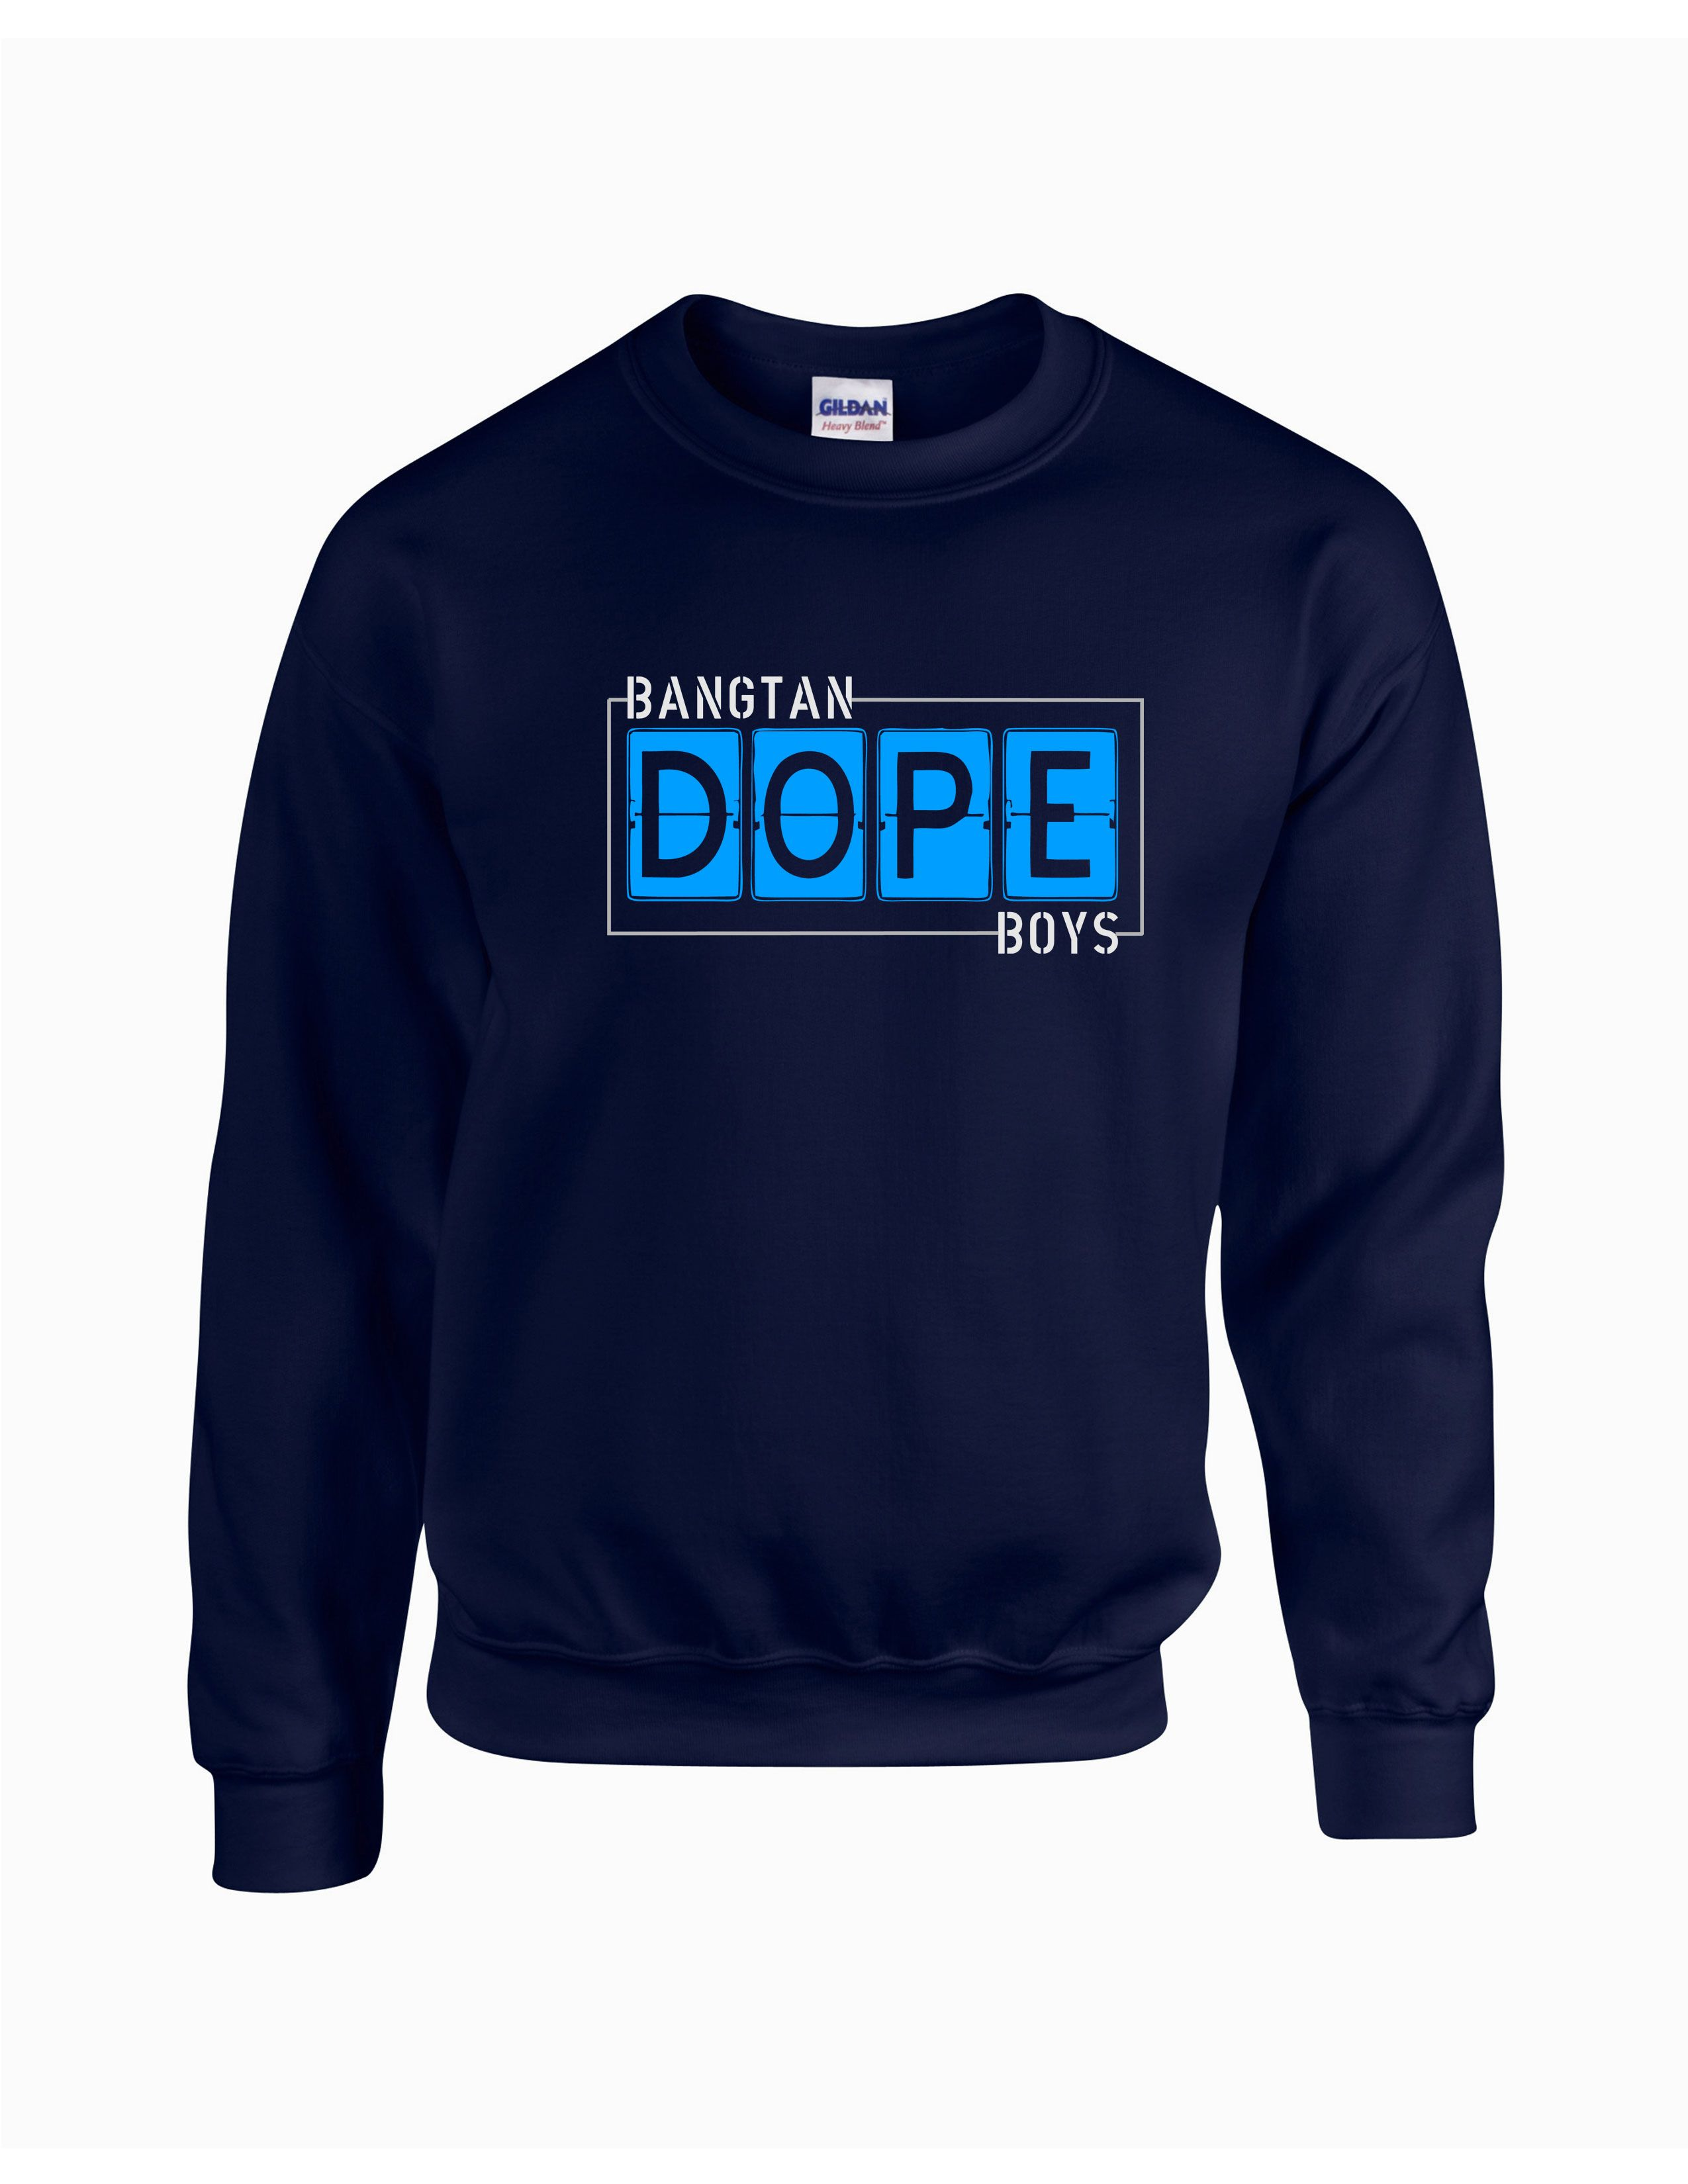 BTS Dope Sweatshirt | Kpop shirts | Kpop shirts, Sweatshirts, Kpop